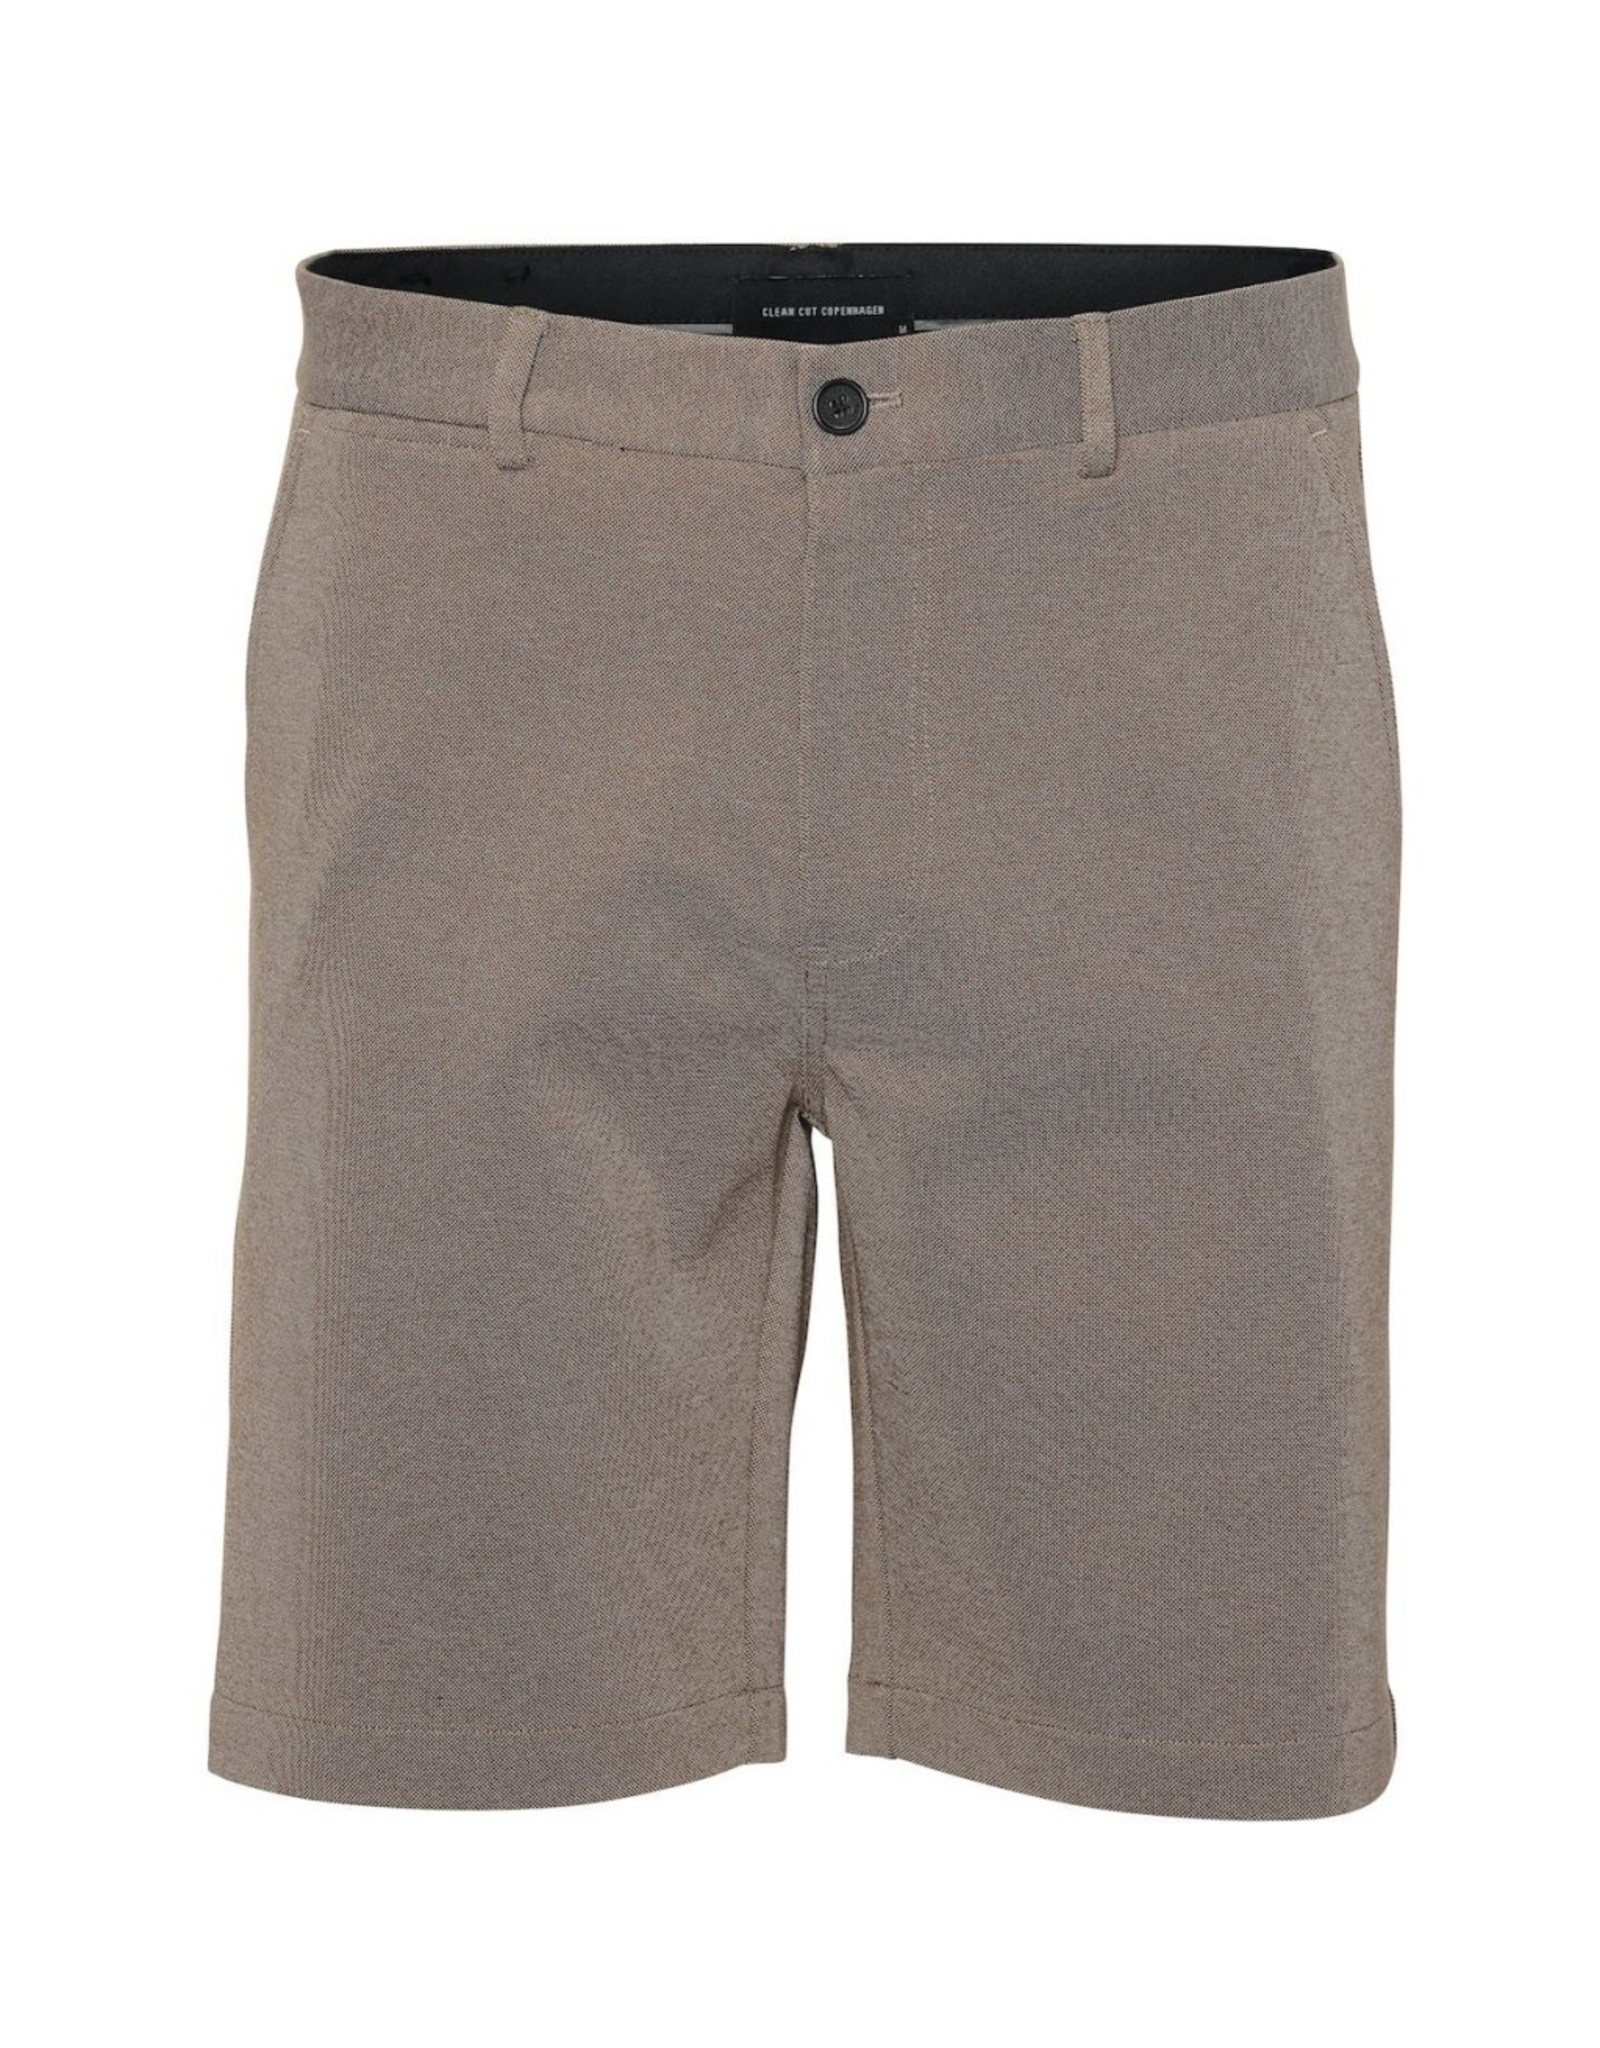 Clean Cut Copenhagen Milano Jersey Shorts